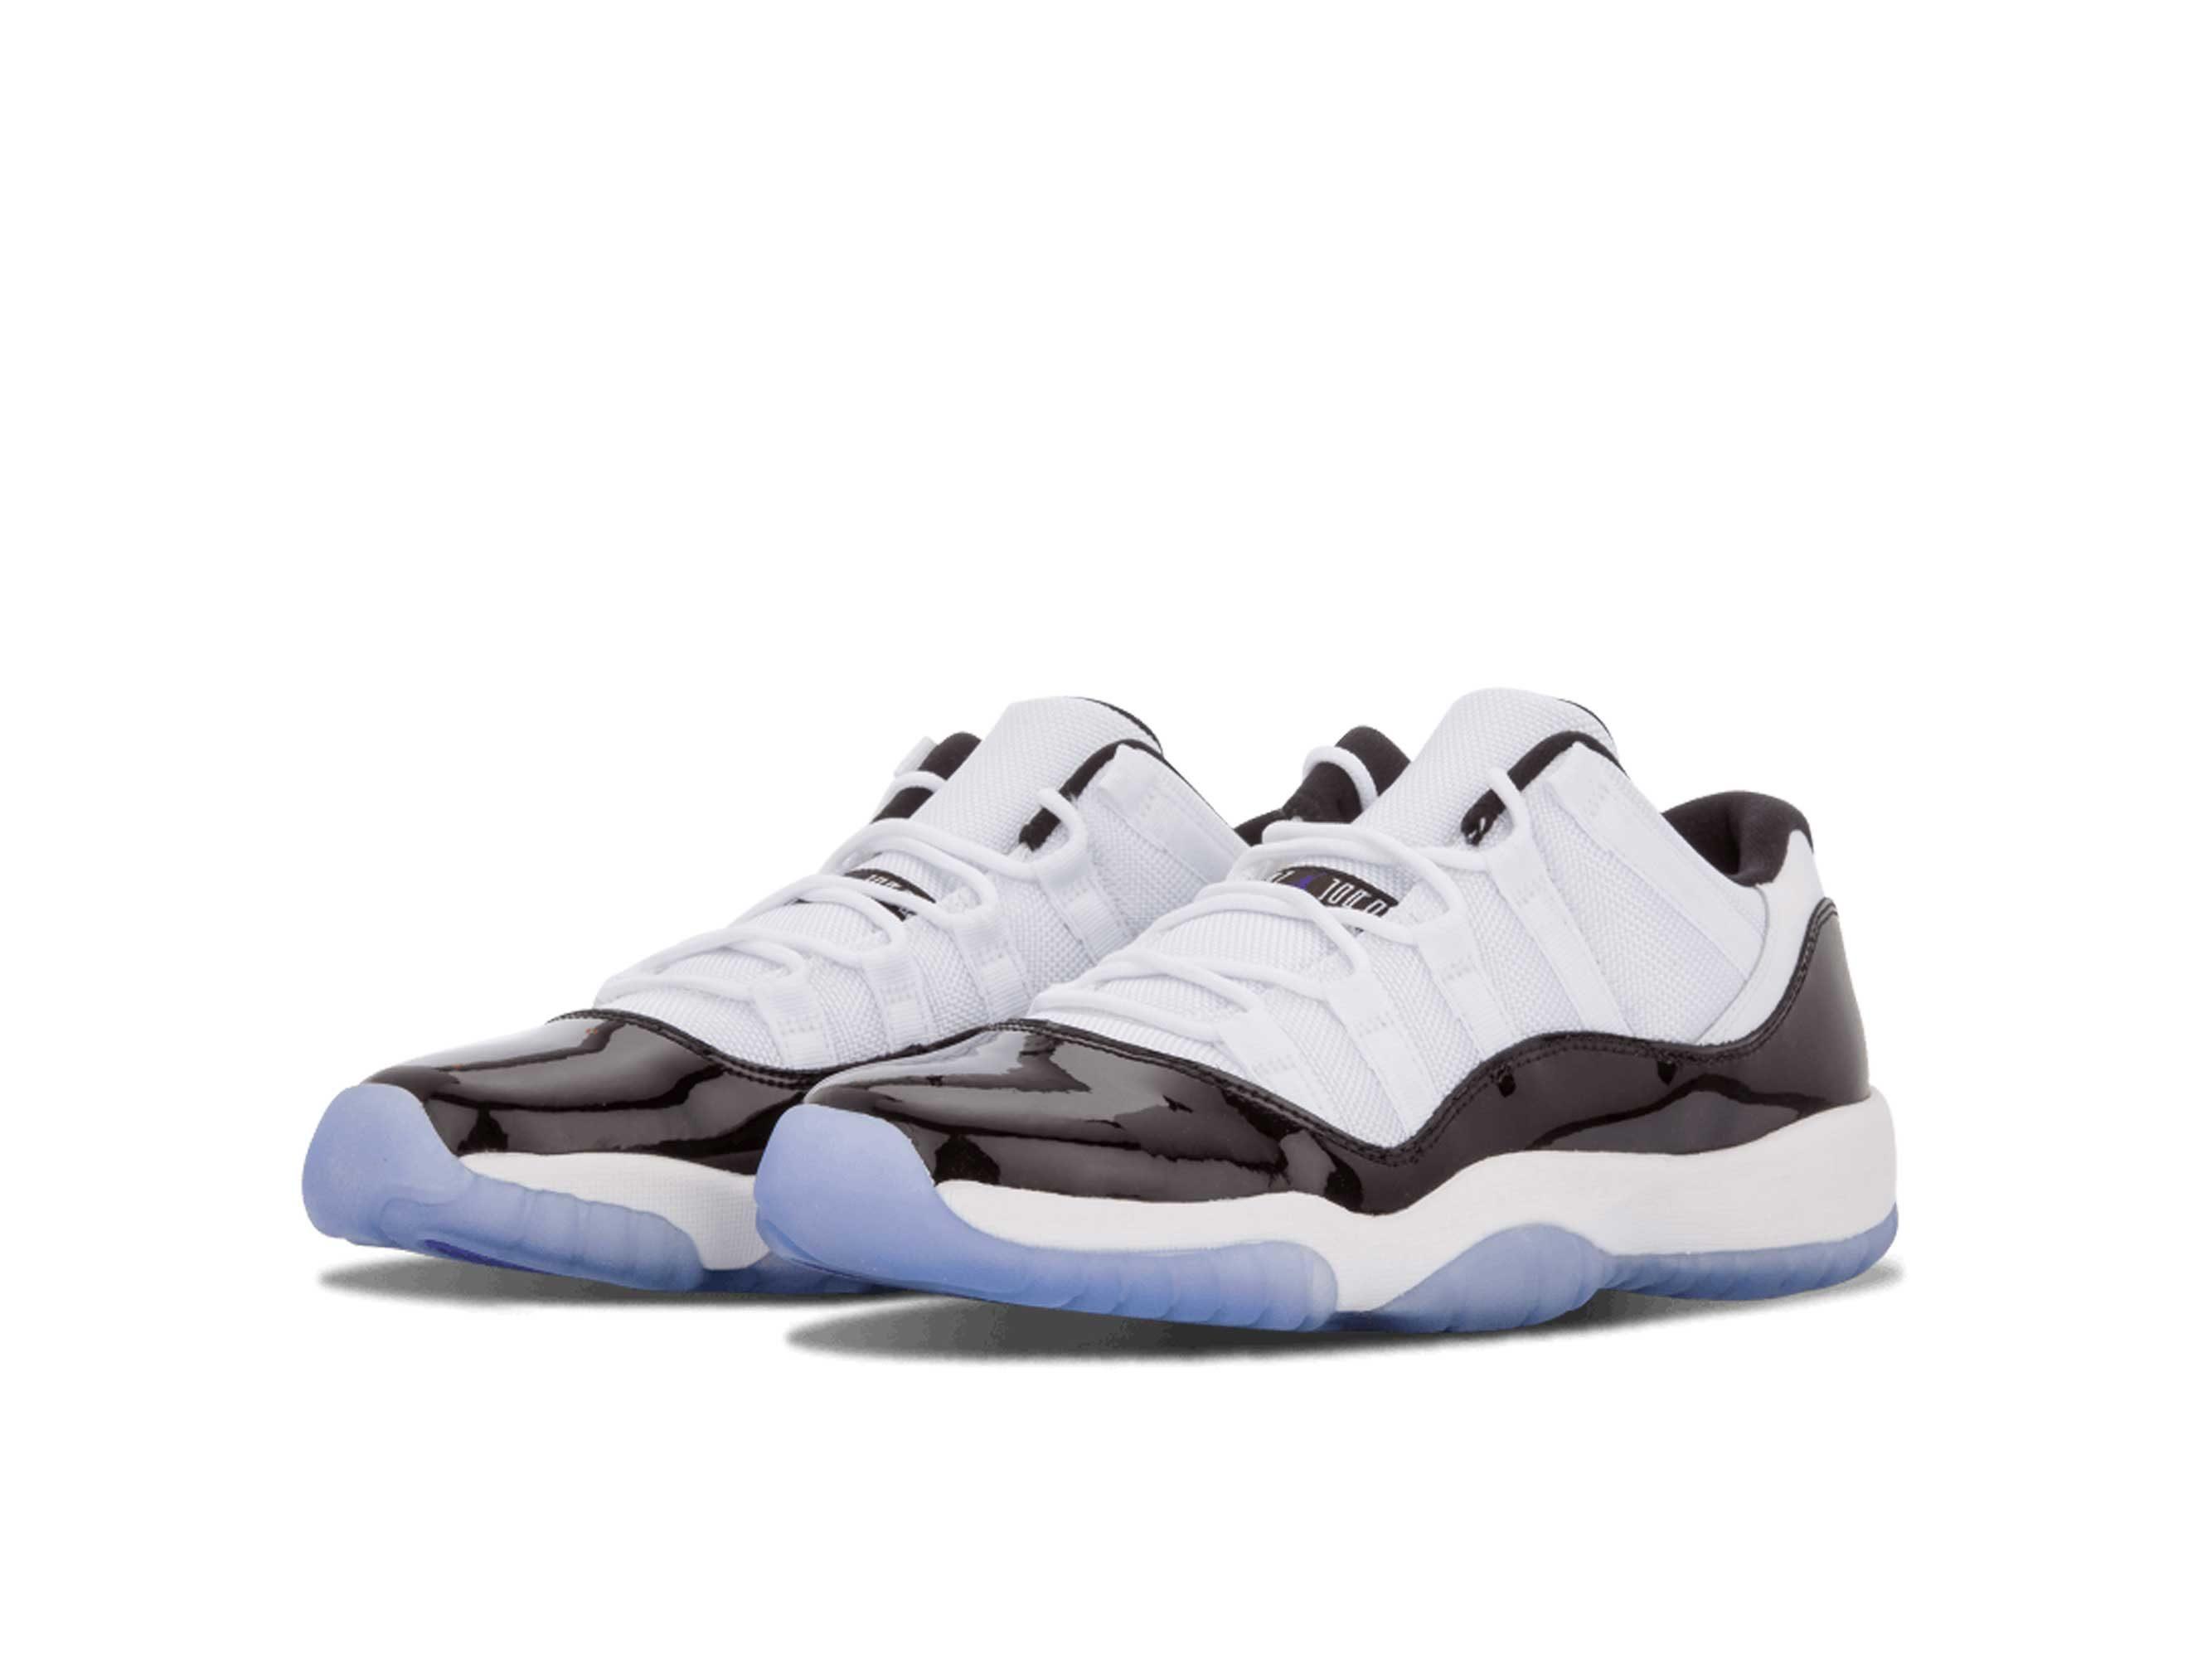 nike air Jordan 11 retro low bg black white 528896_153